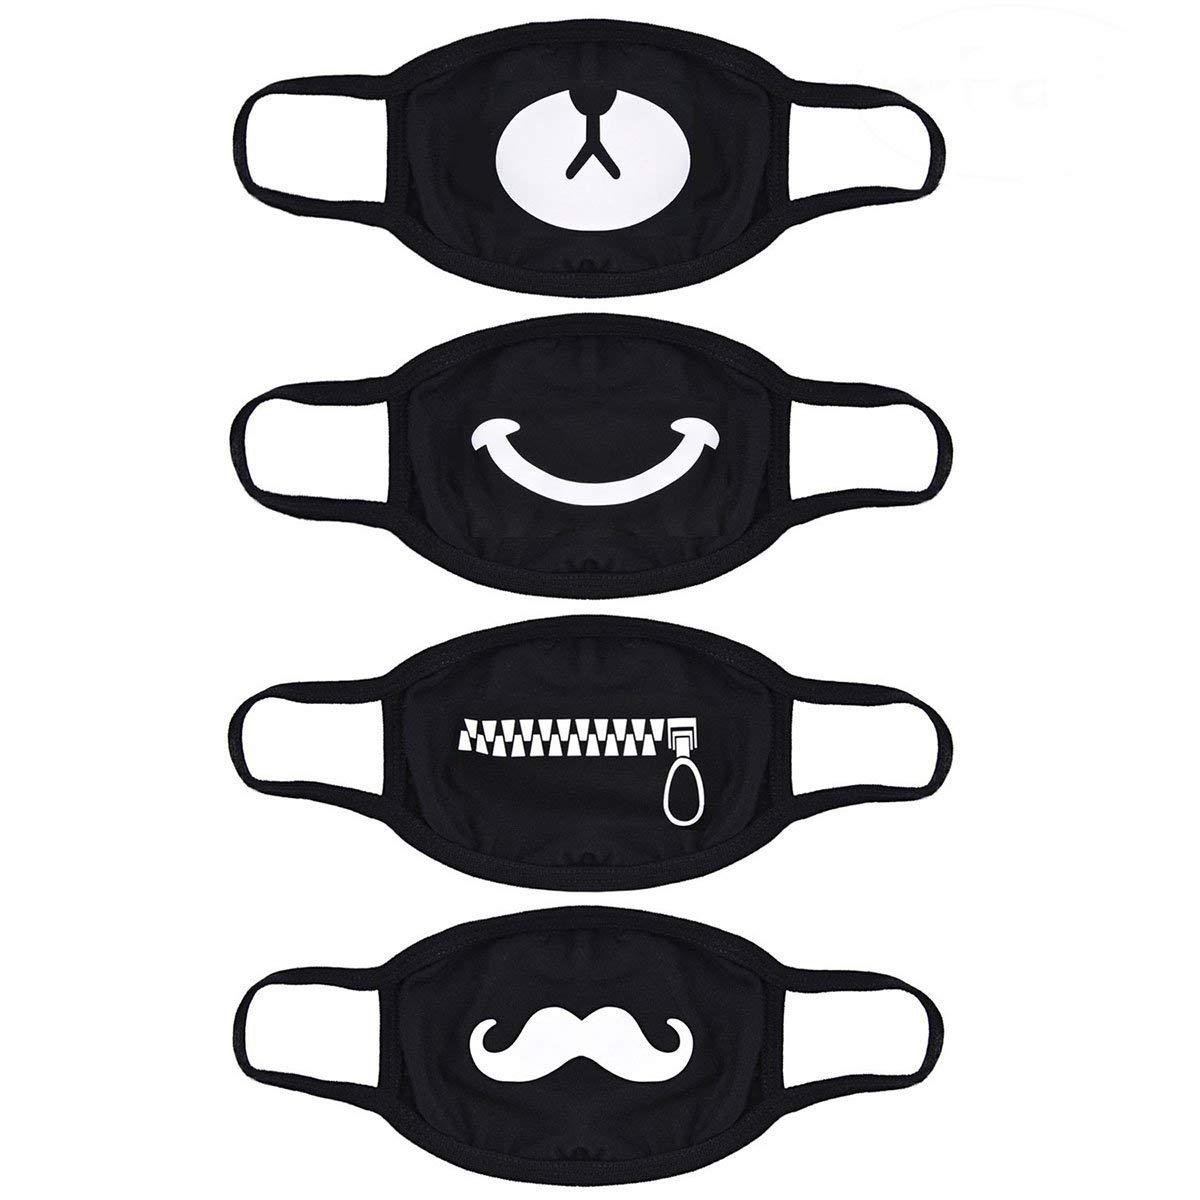 TOOGOO(R) Mouth Mask,4 Pack Kpop Mask Anti-dust Cotton Face Mask for Men and Women (1 bear 1 zipper 1 smile 1 beard)